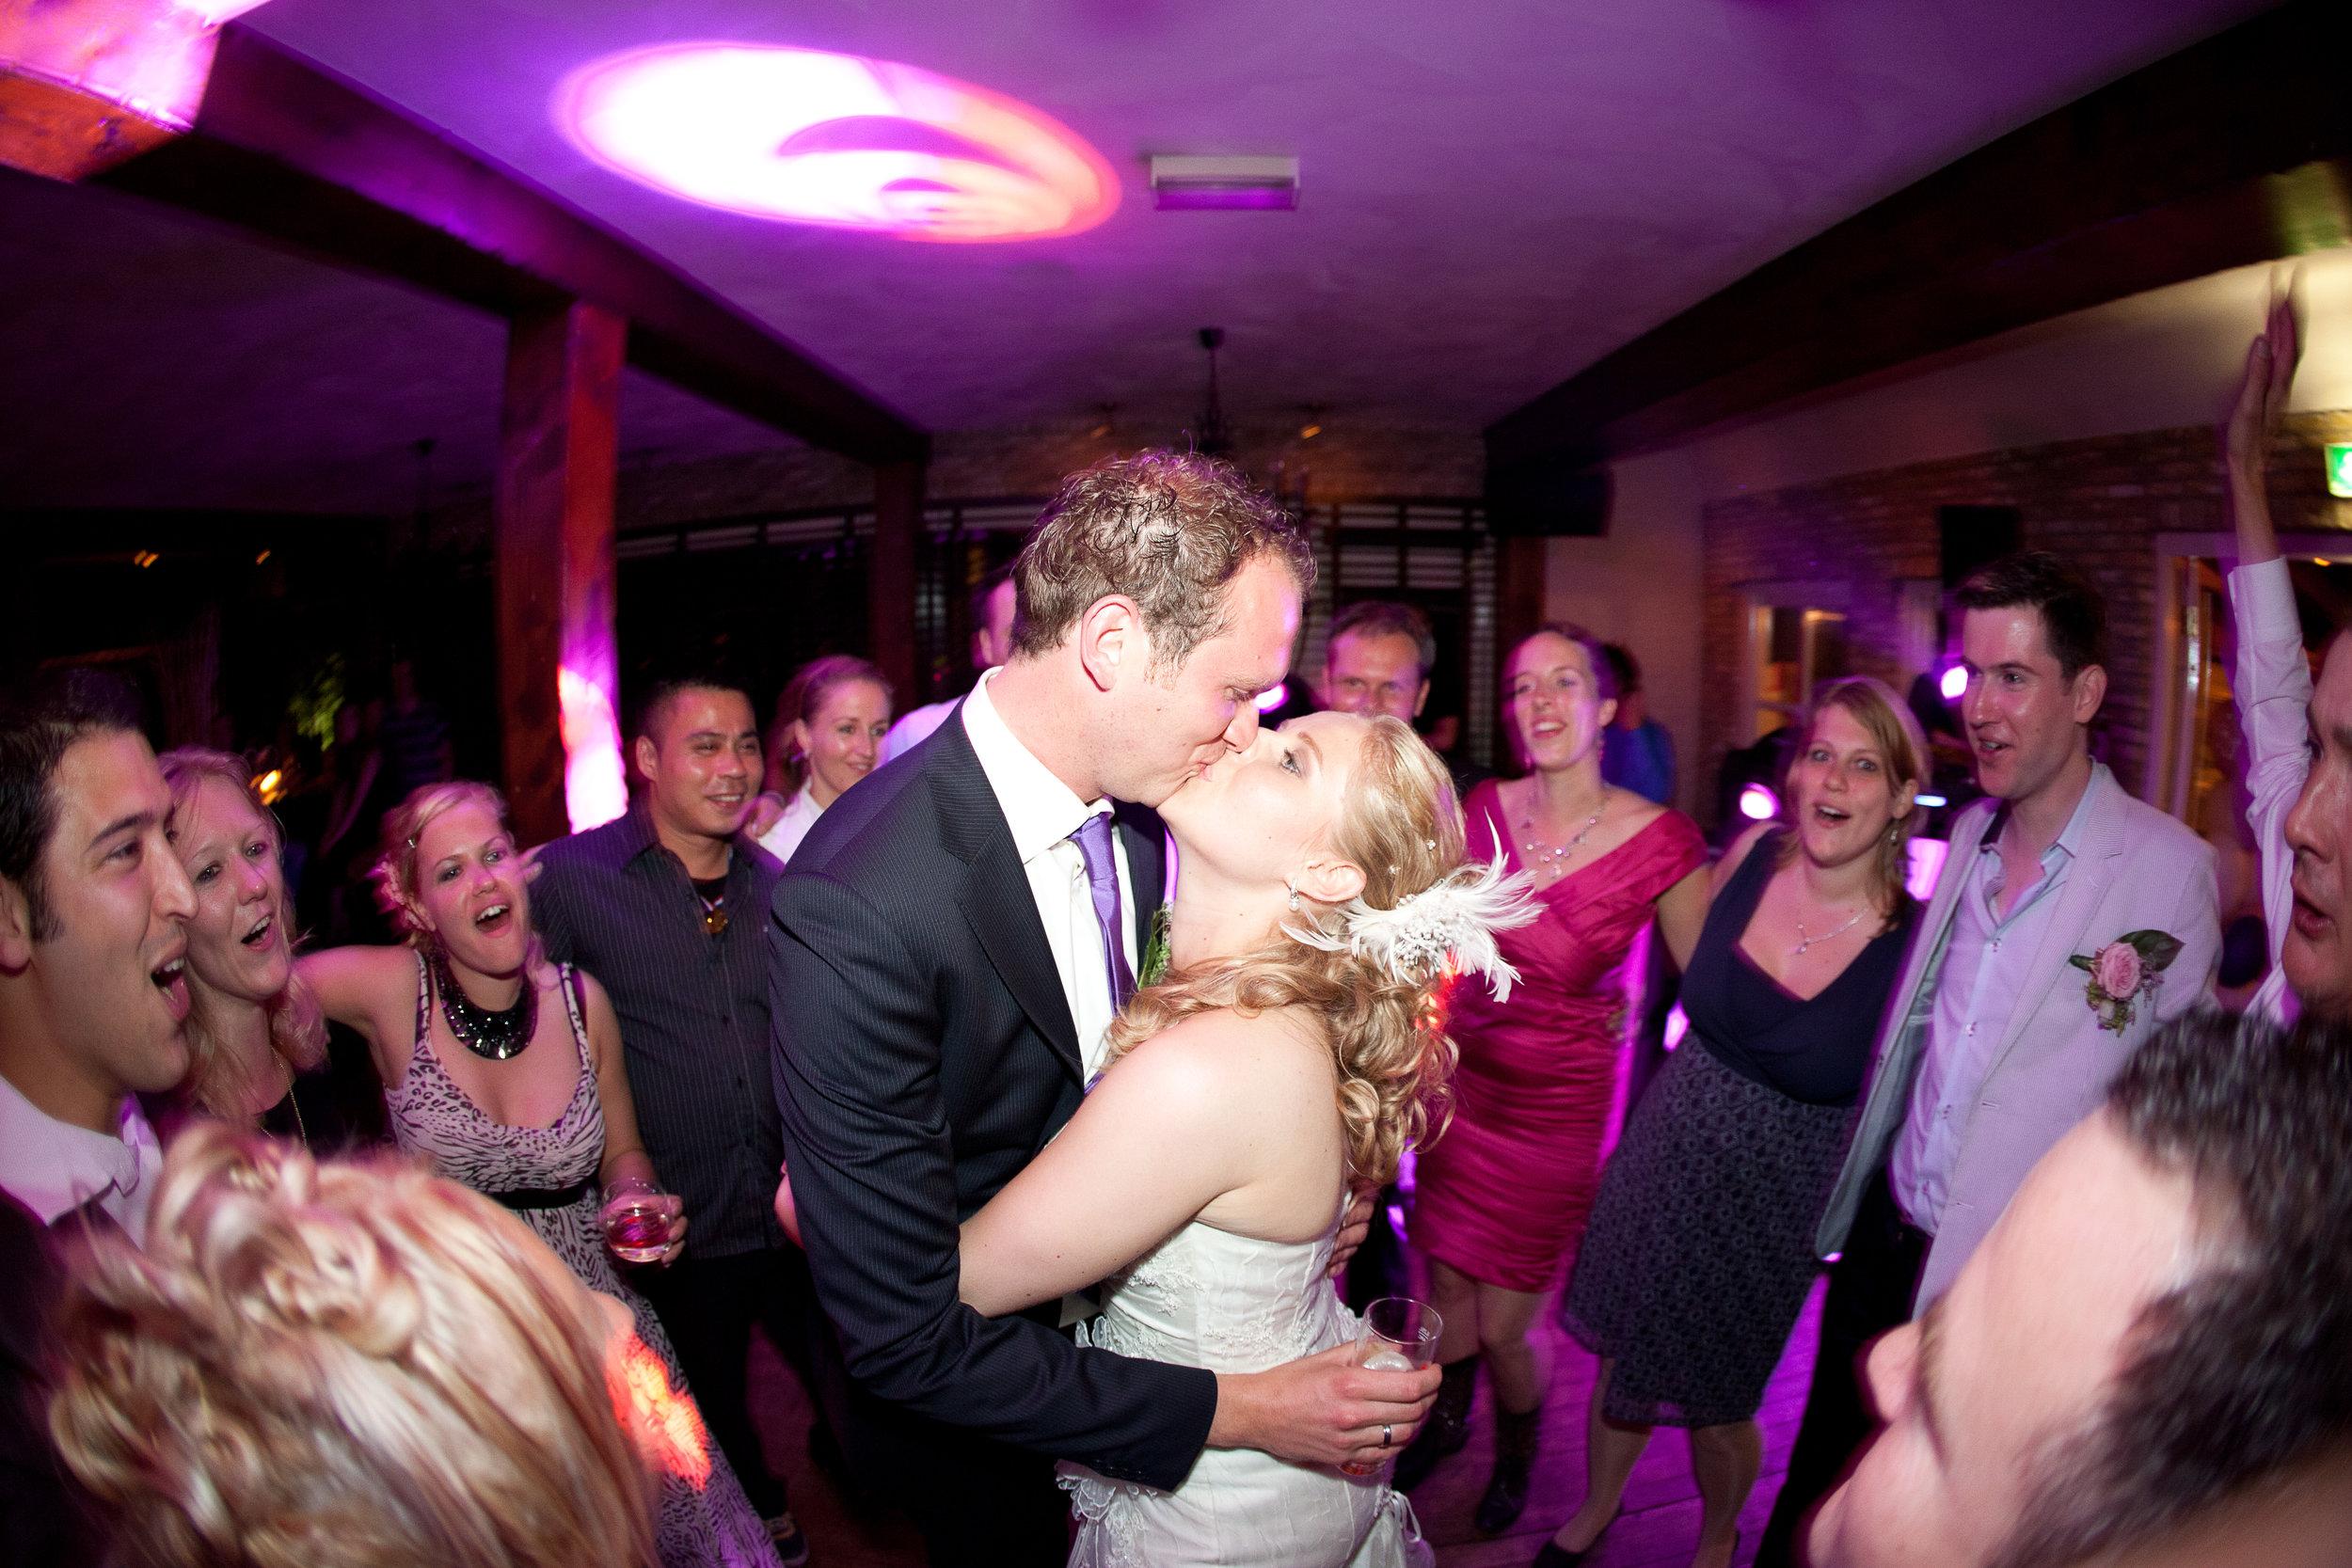 trouwshoot-bruidsfotografie-trouwfoto-feestfotografie-trouwreportage-Laurens en Bettiana575.jpg